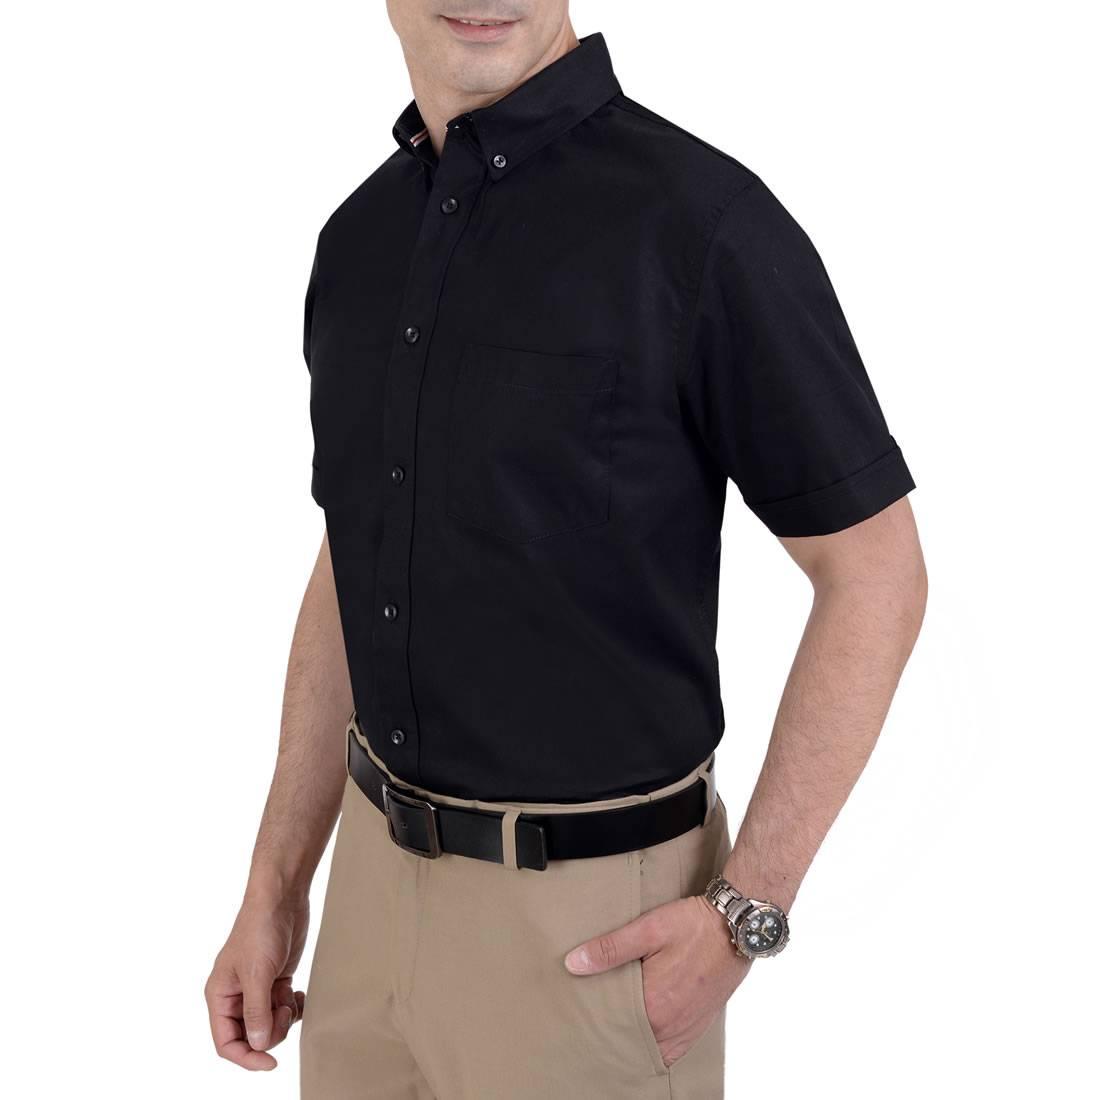 042331381709-02-Camisa-Manga-Corta-classic-Fit-Negro-yale